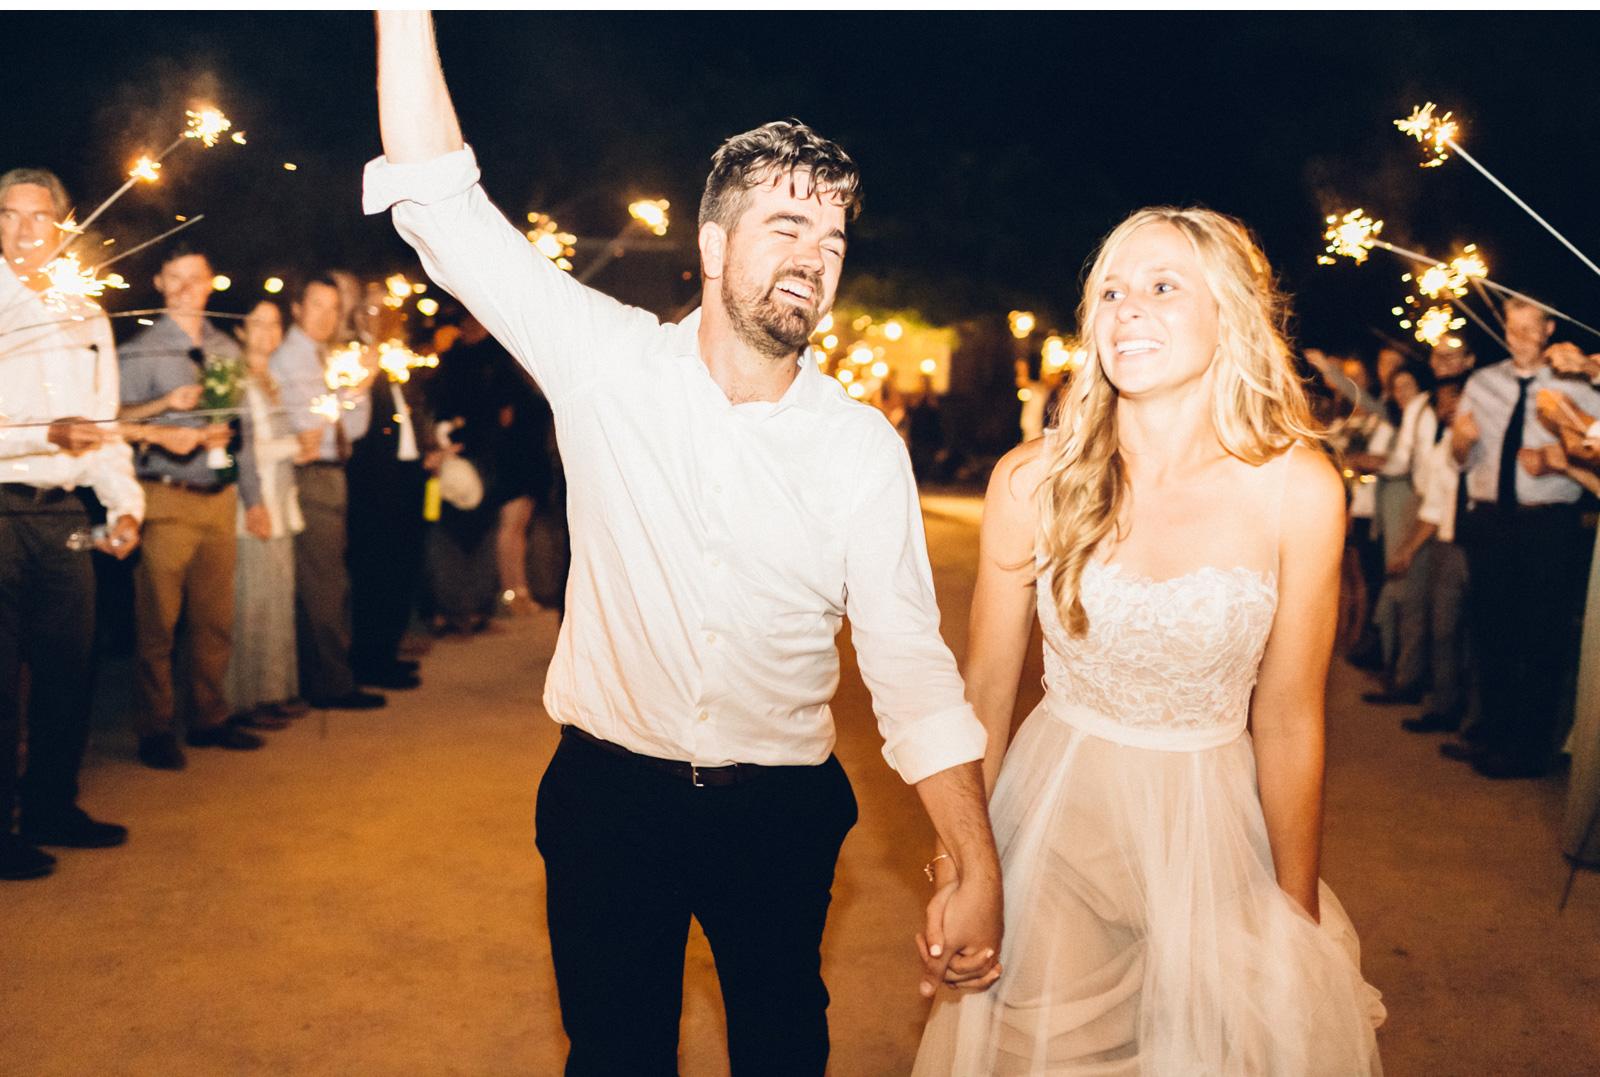 Avila-Beach-Wedding-Style-Me-Pretty-Natalie-Schutt-Photography_02.jpg